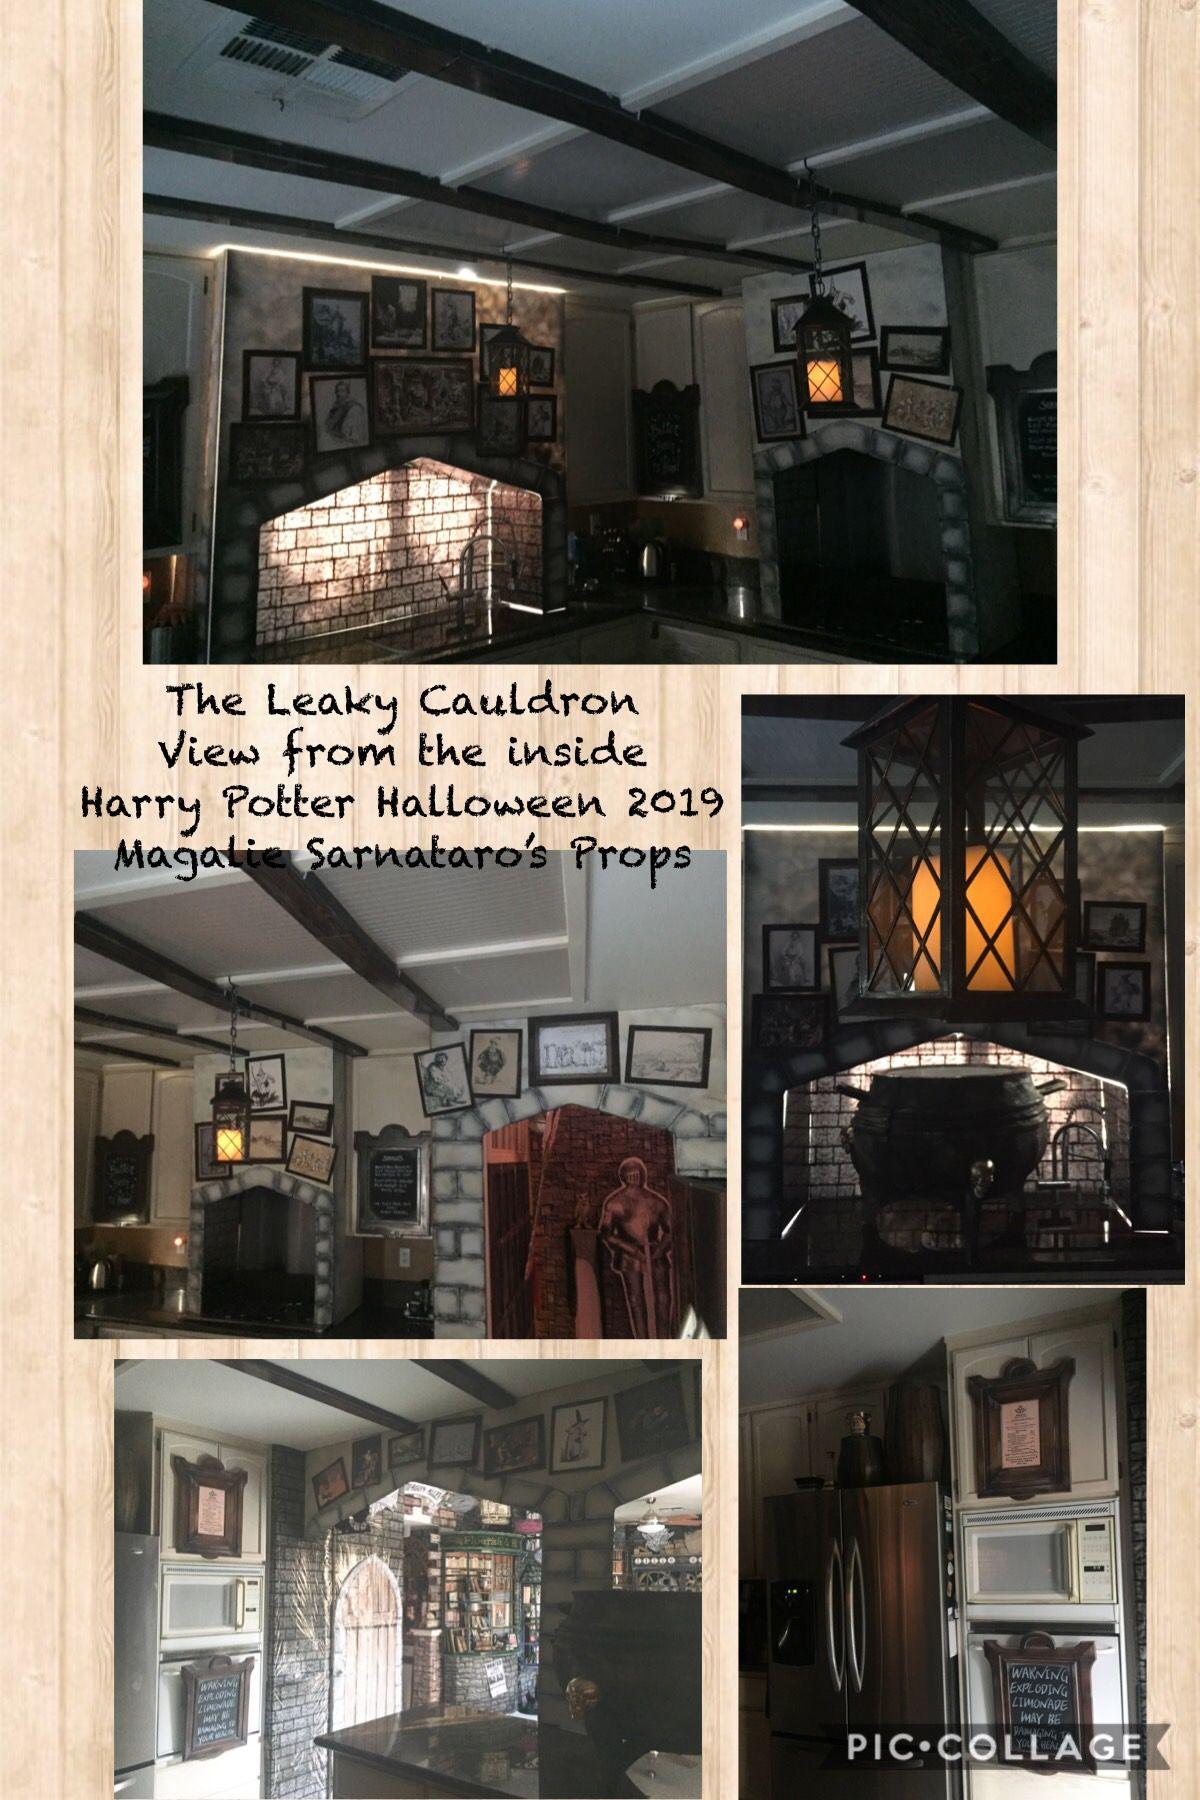 Leaky Cauldron Harry Potter Magalie Sarnataro S Props Harry Potter Halloween Leaky Cauldron Halloween 2019